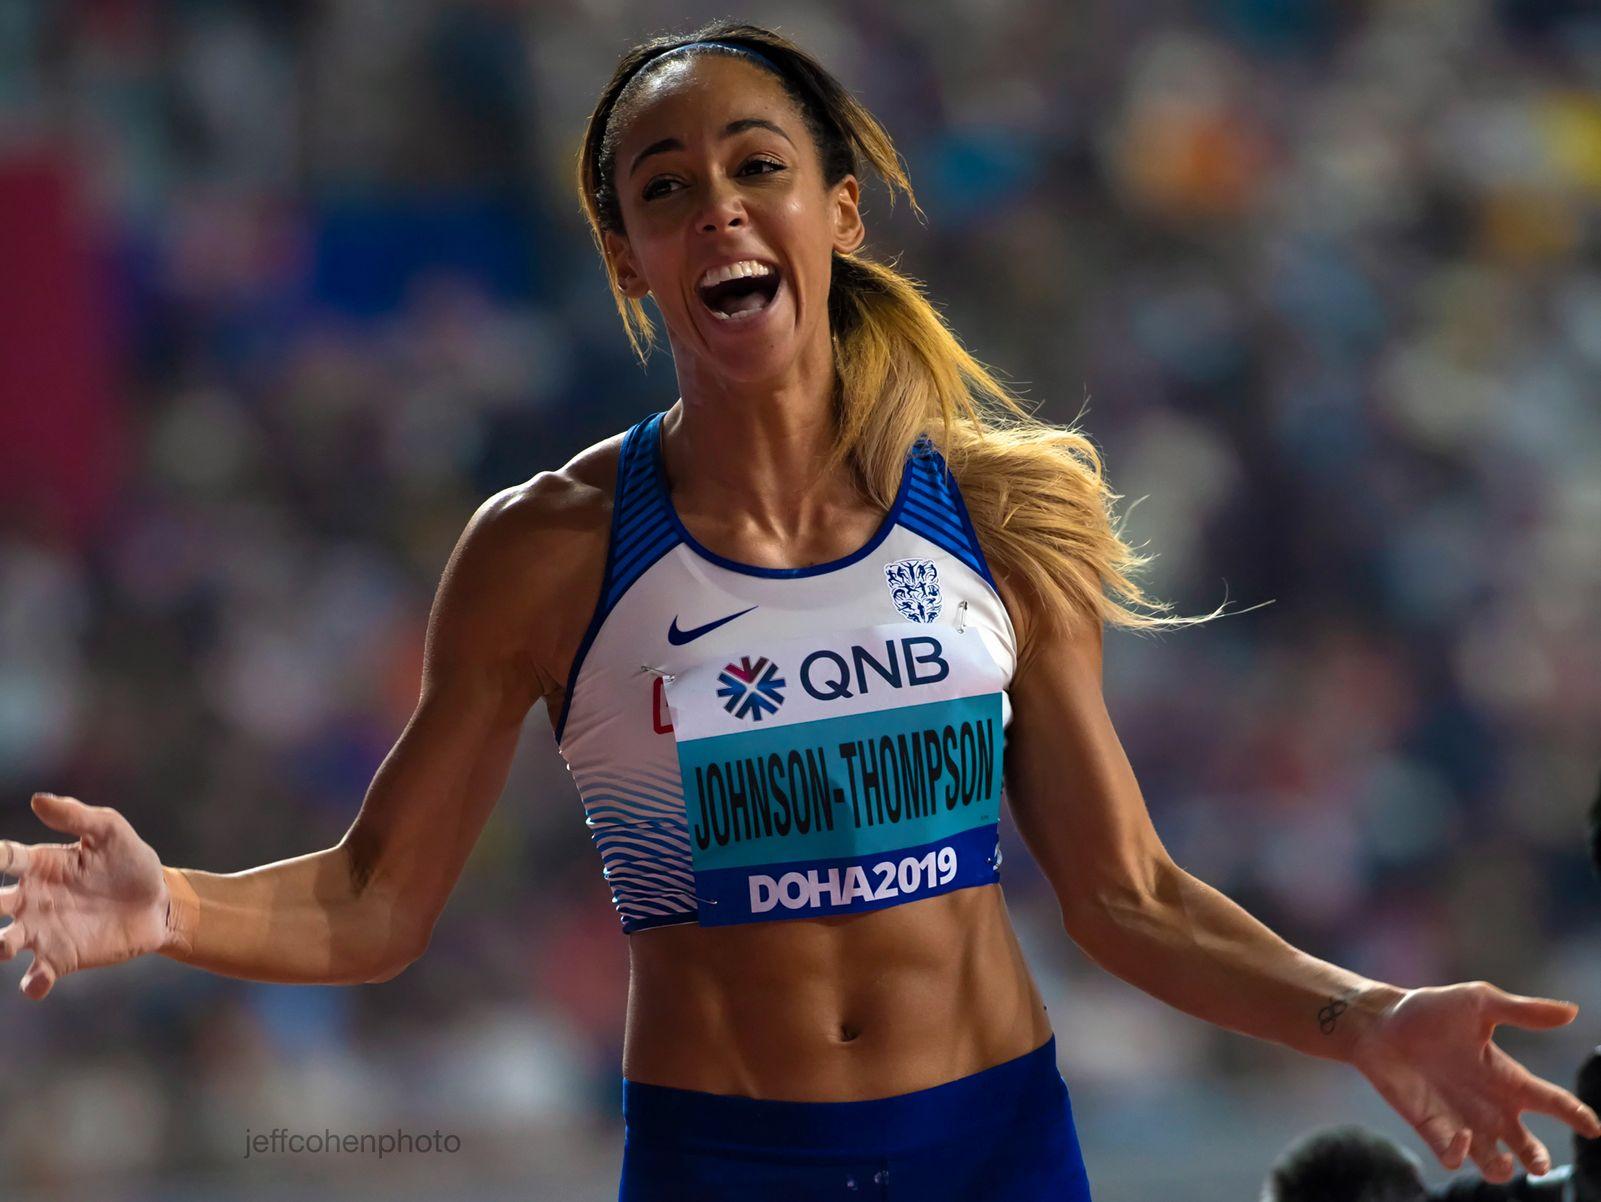 Katarina Johnson thompson, heptathlon. 2019 iaaf world athletics championships doha,qatar